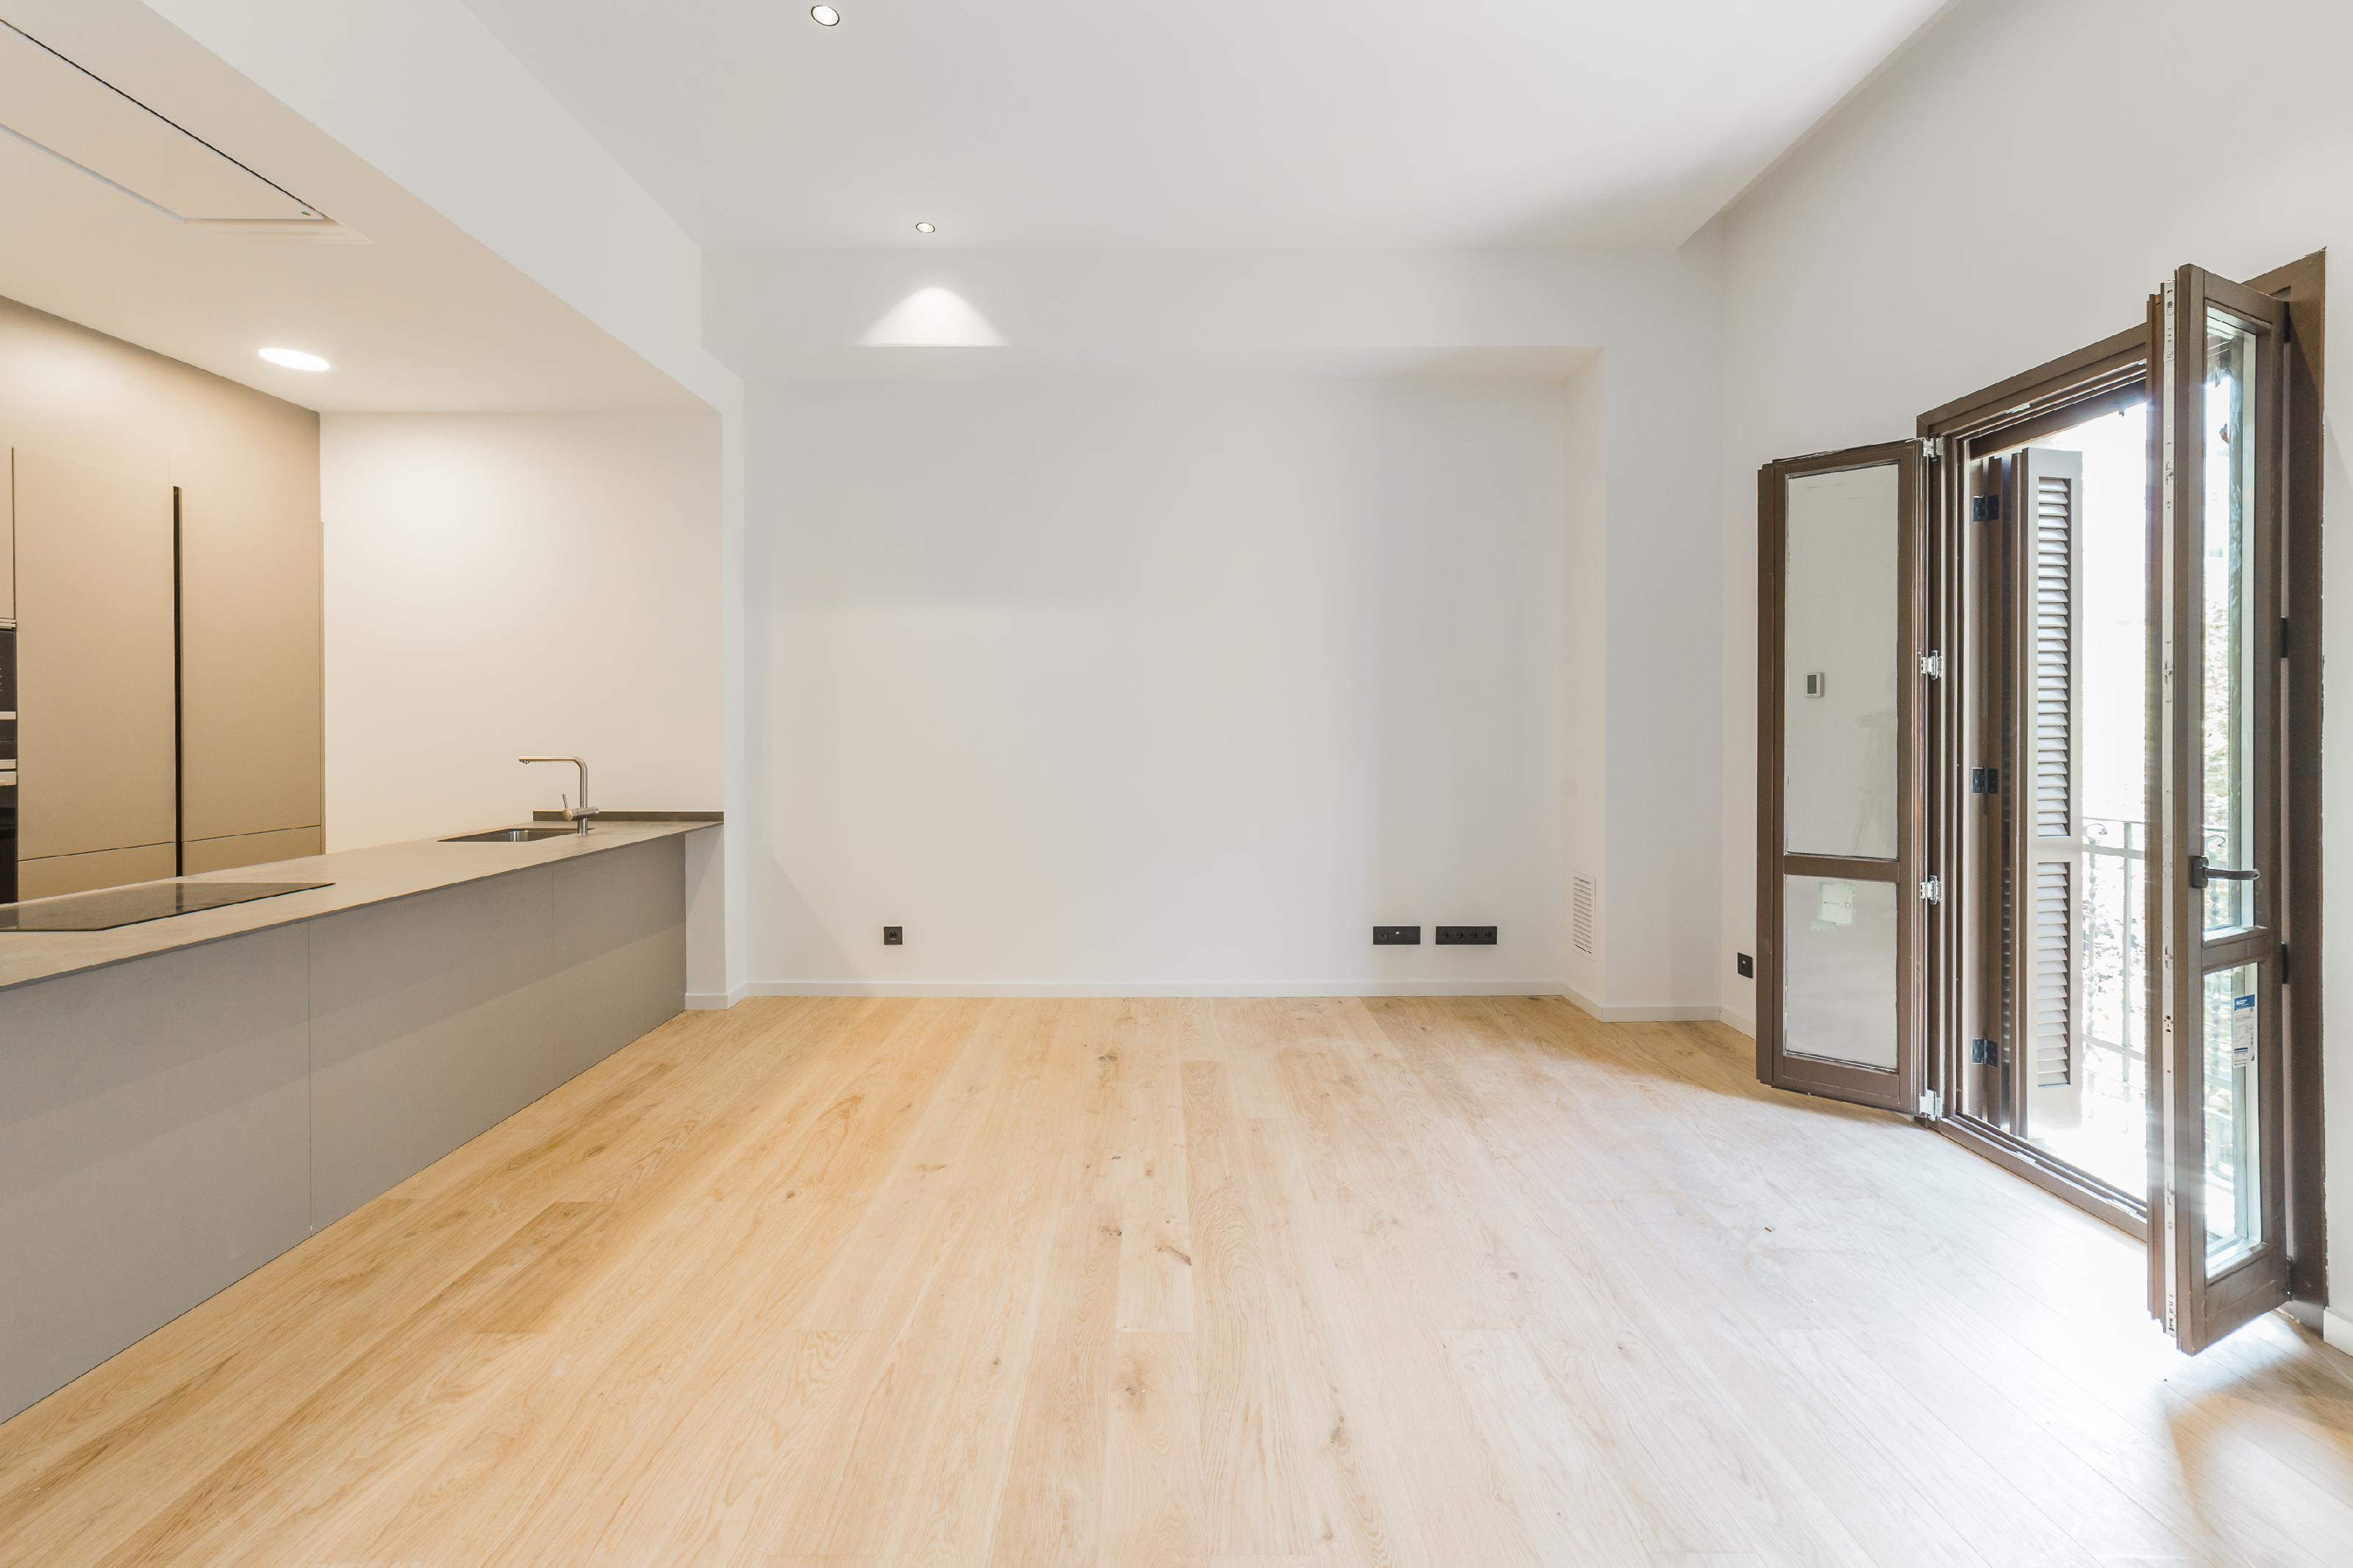 182456 Apartamento en venda en Eixample, Antiga Esquerre Eixample 2